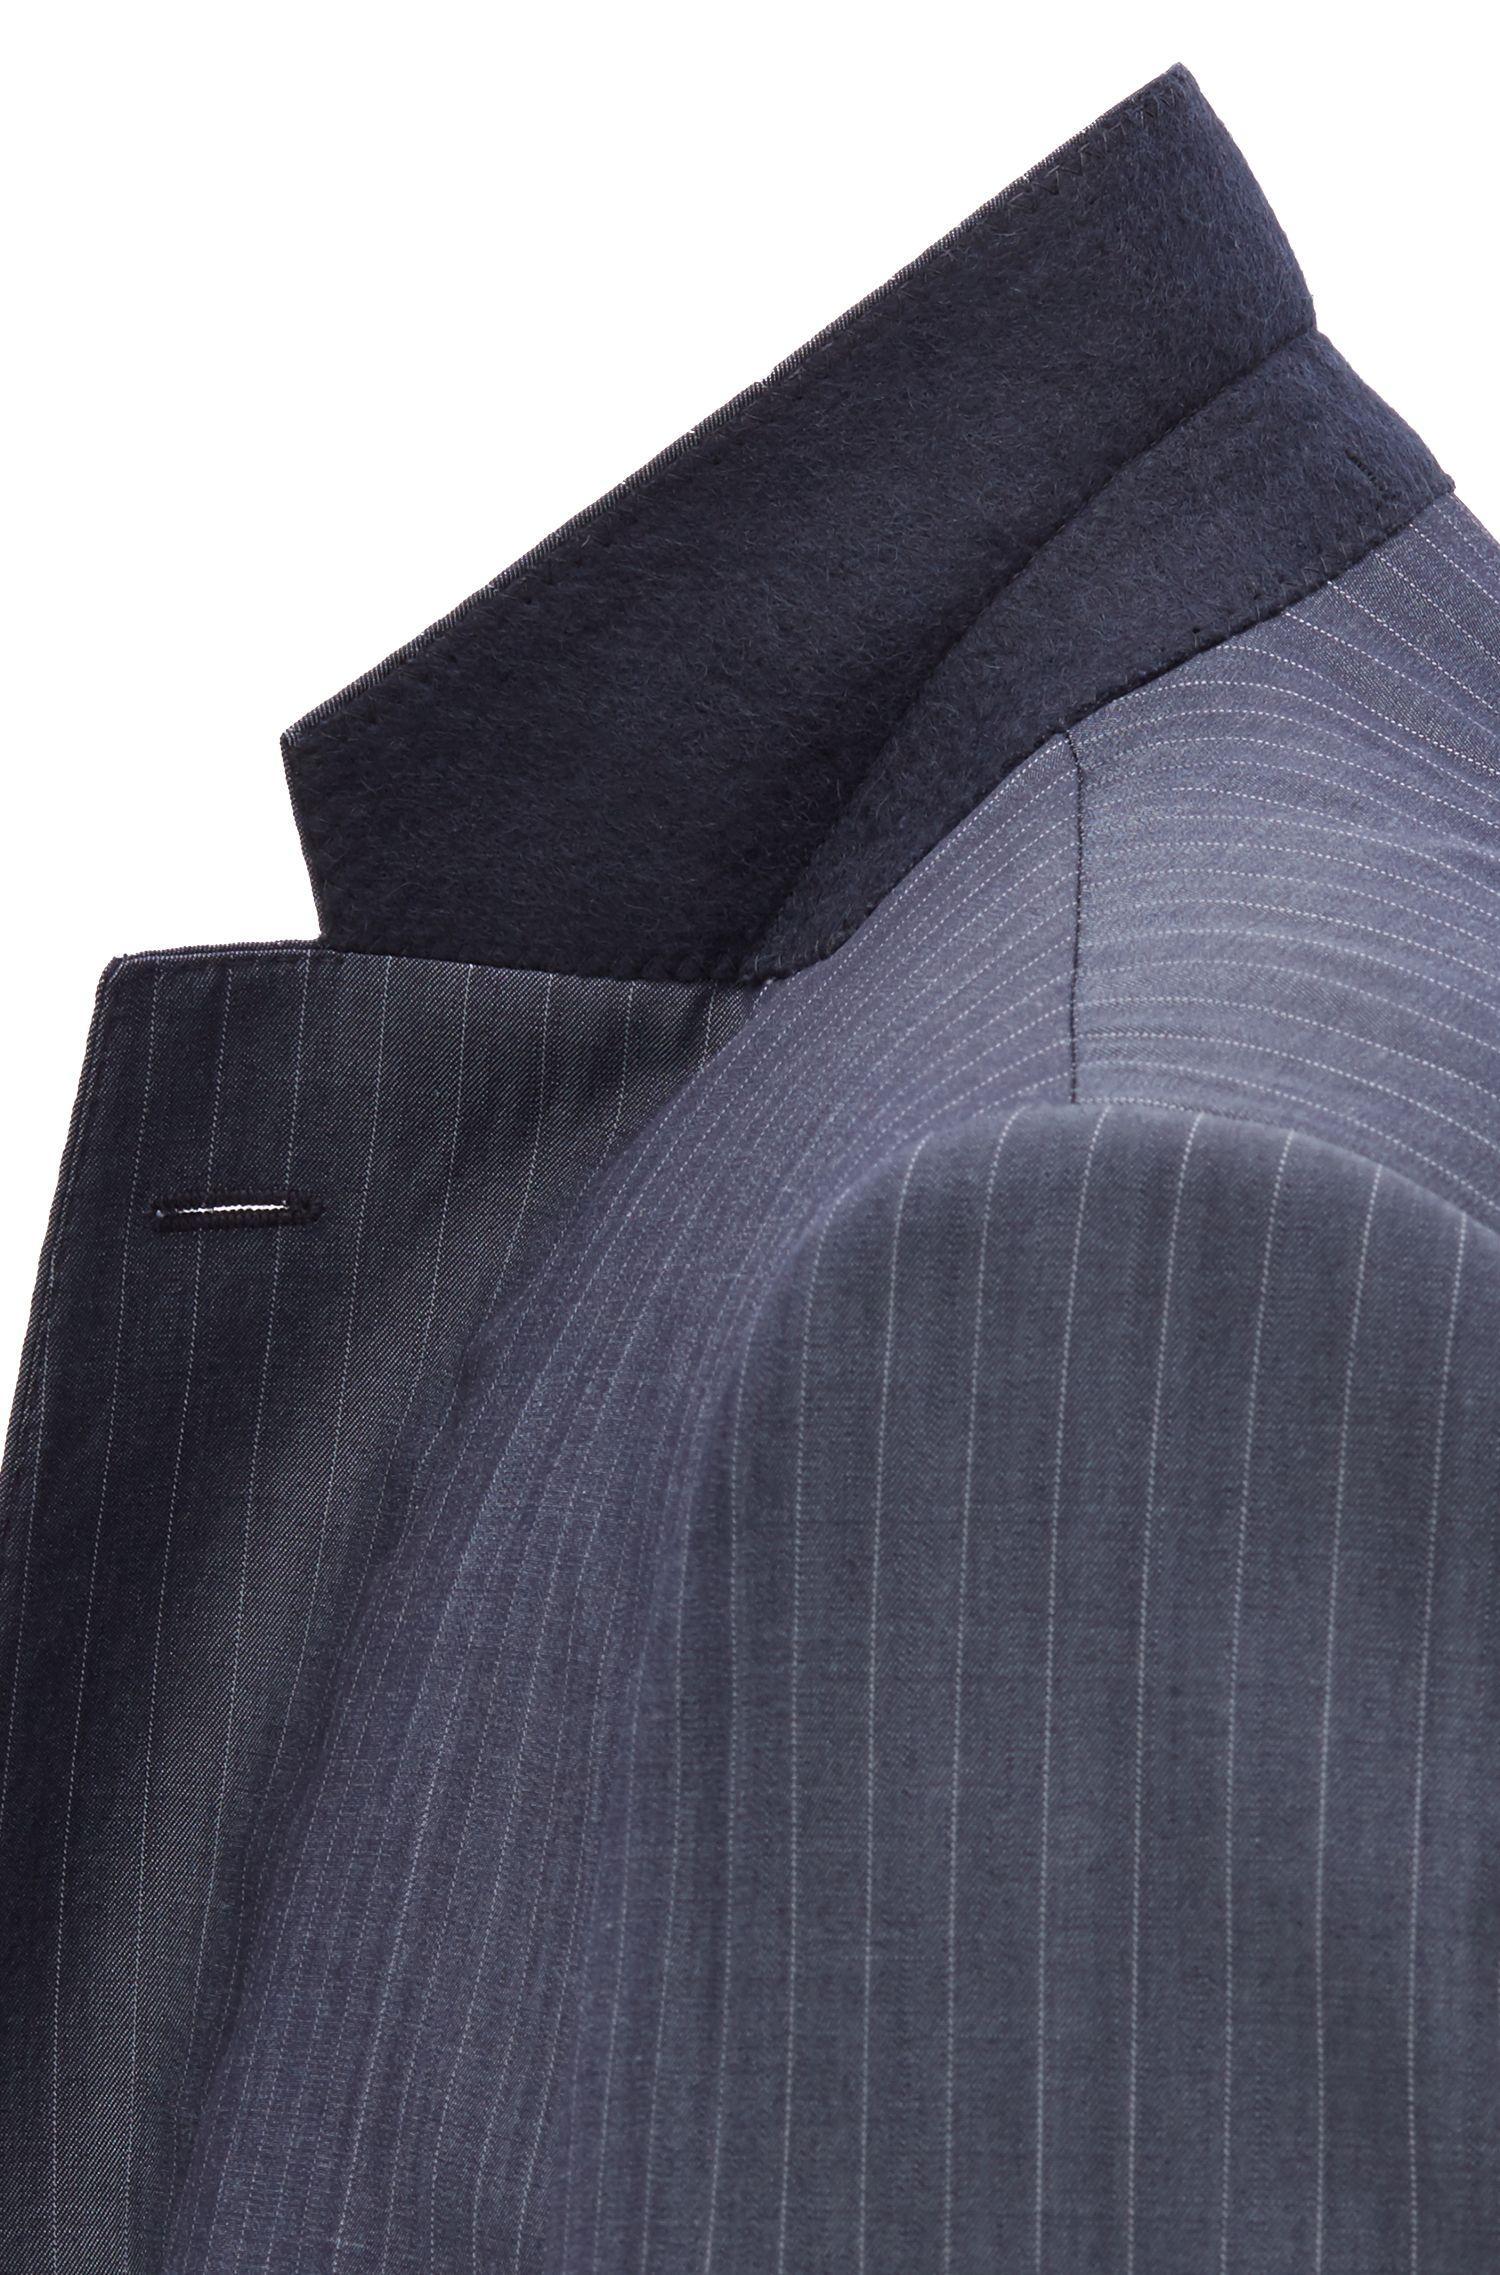 e38e0179d BOSS Regular-fit Suit In Striped Virgin Wool in Blue for Men - Save 30% -  Lyst